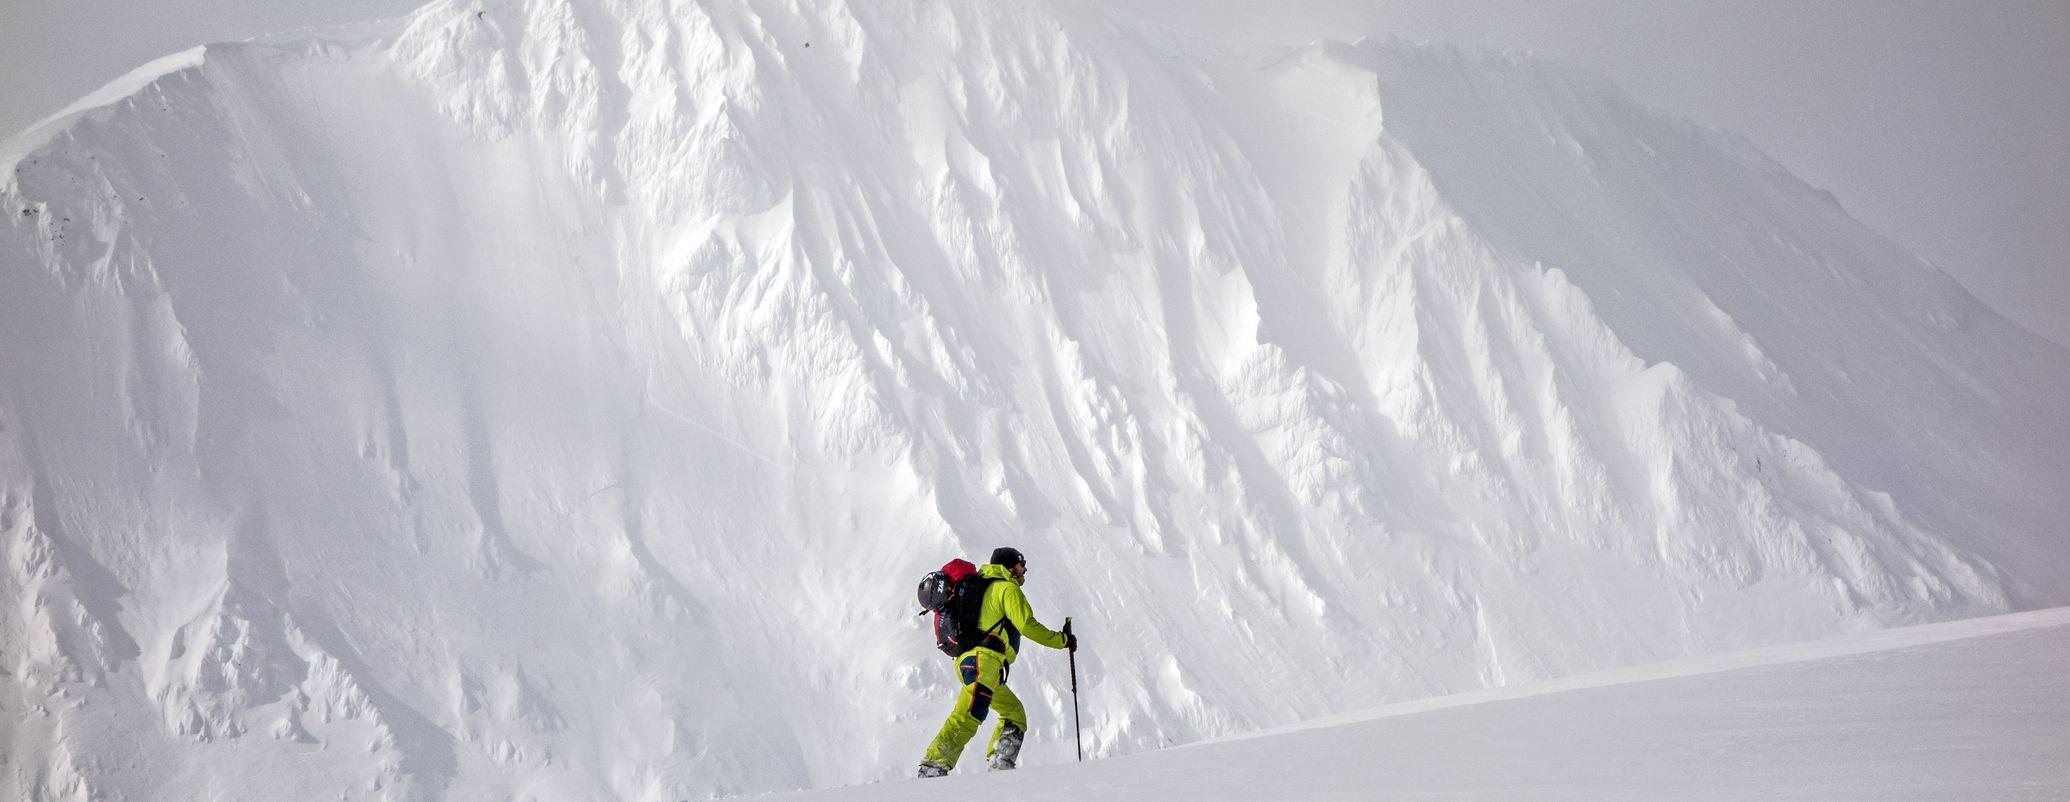 Millet ski freeride ski rando wadeck gorack